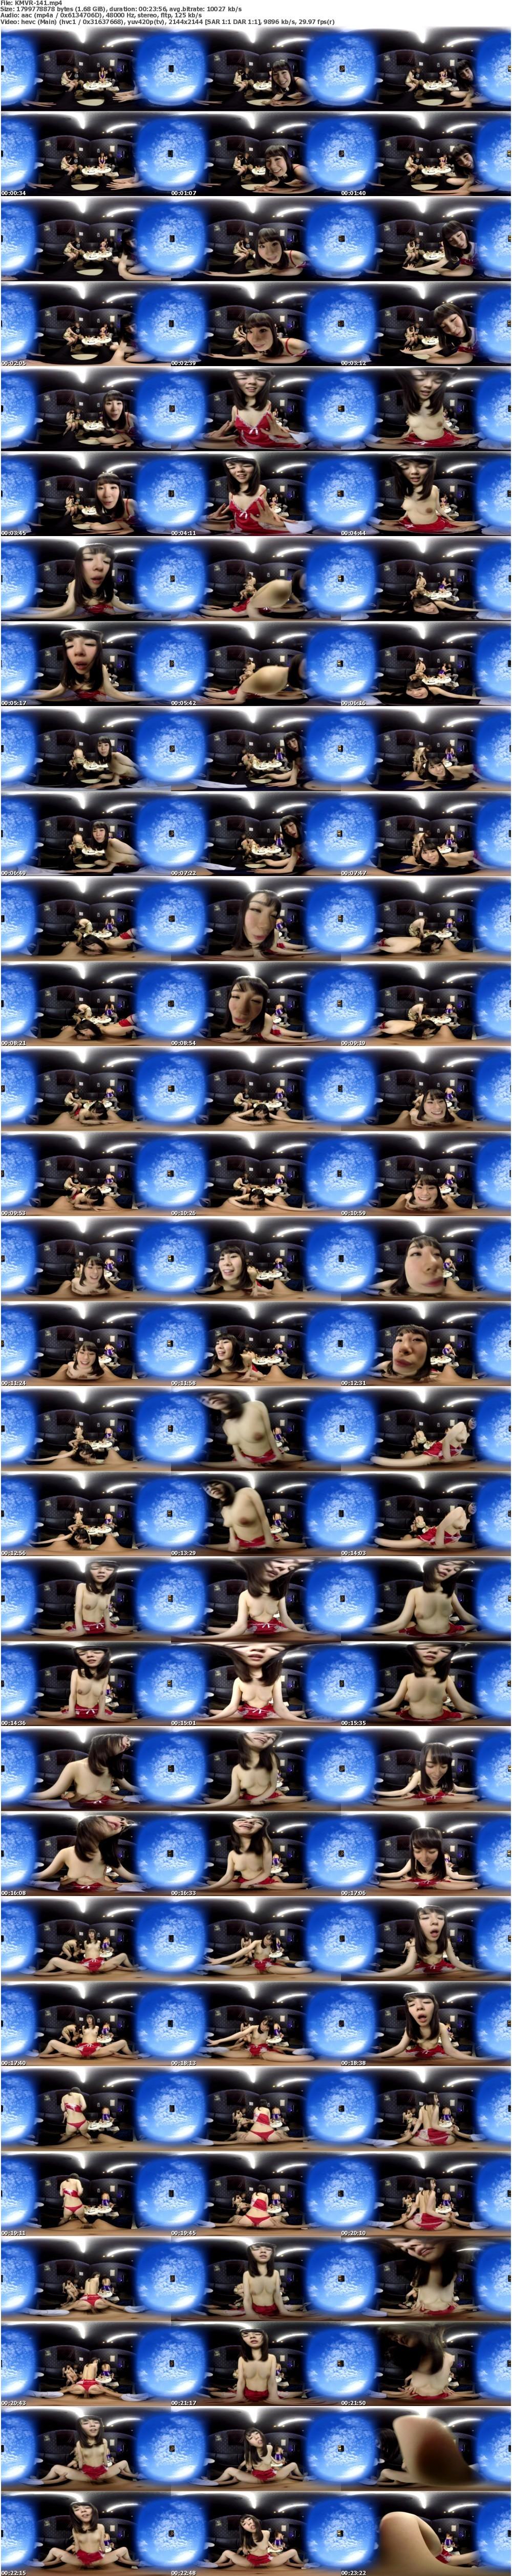 [VR/3D] KMVR-141 【VR】おっぱぶ体験!!当店自慢の指名率No.1のゆずちゃんが本日は貴方にスペシャル中出しSEX!!